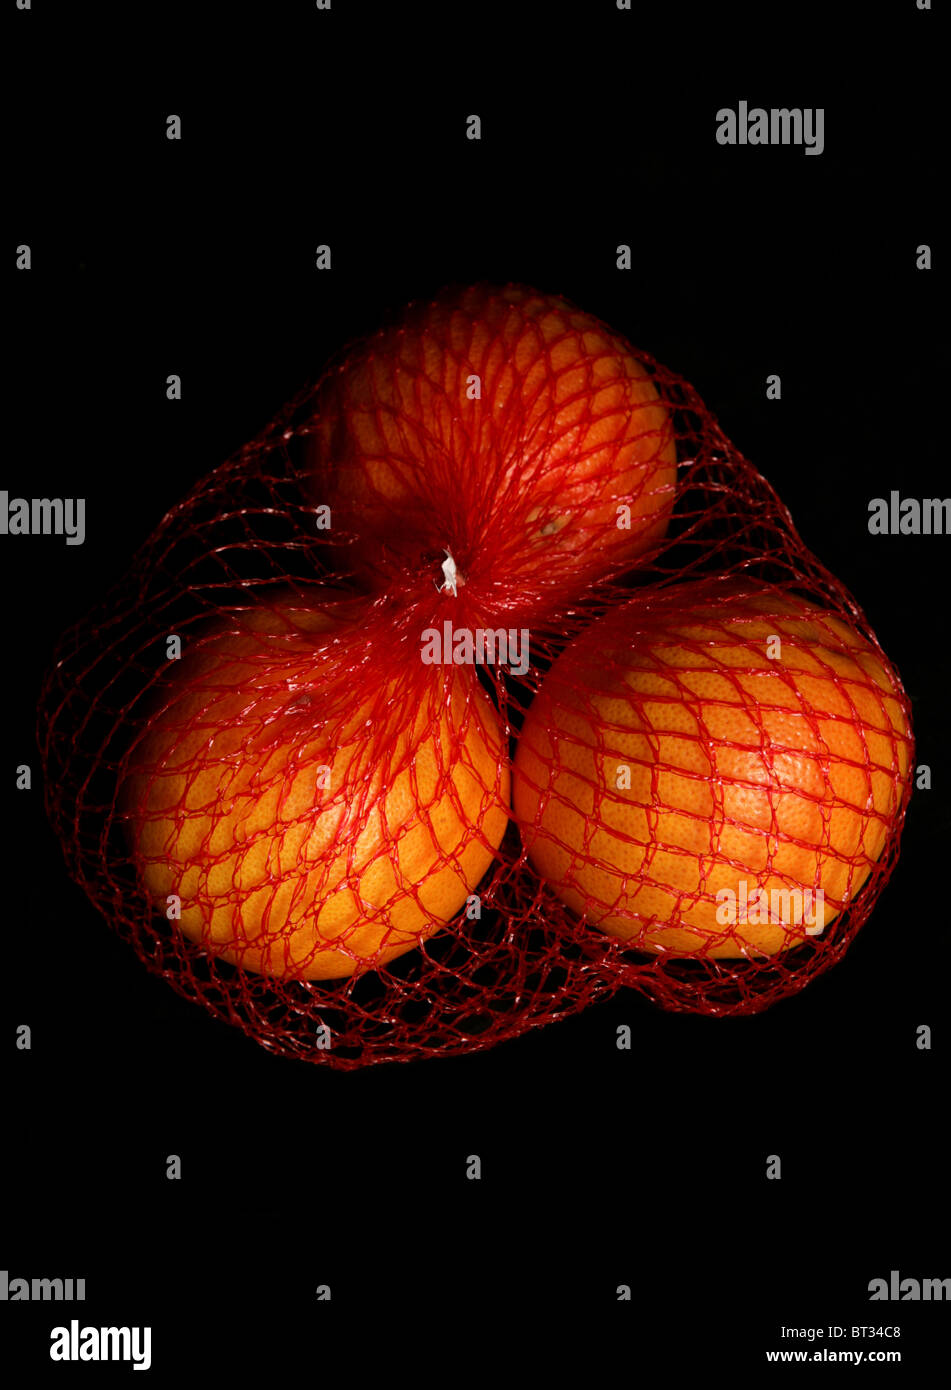 Three oranges isolated on a black background - Stock Image